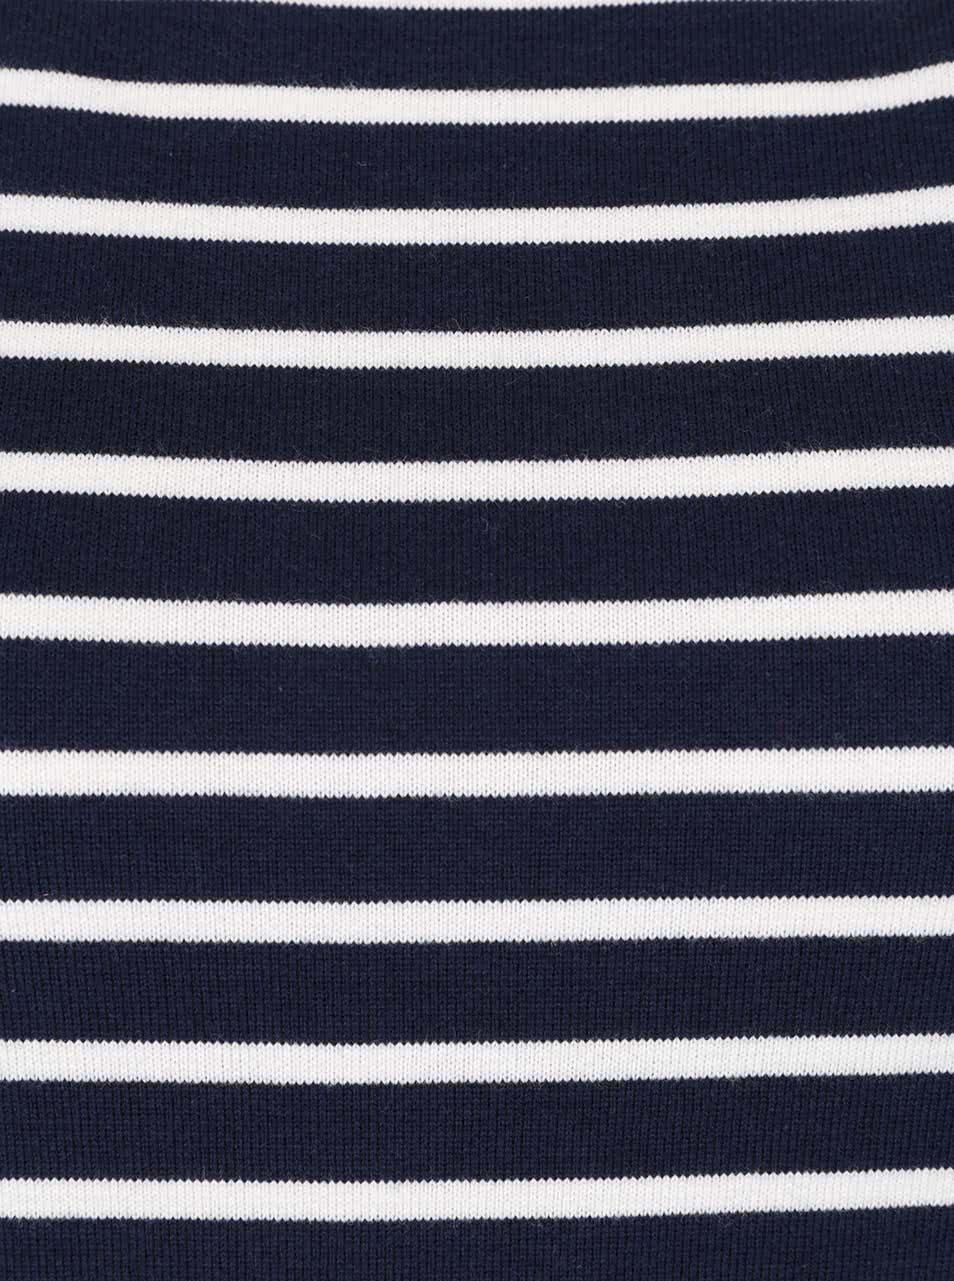 Krémovo-modré pruhované šaty Tom Joule Riviera ... cdf8a2edde